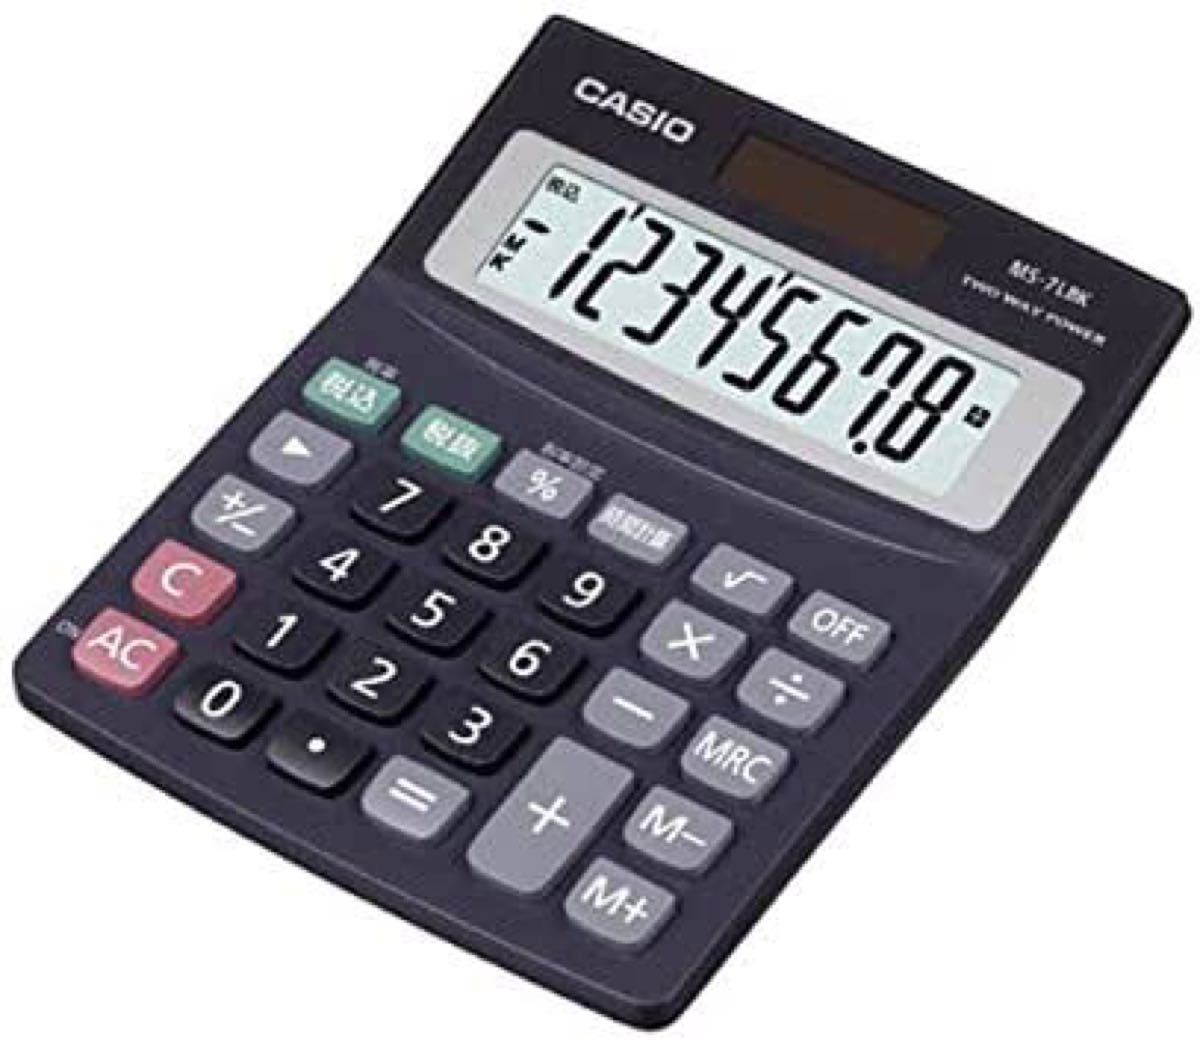 CASIO カシオ 電卓 計算機 時間計算 税計算